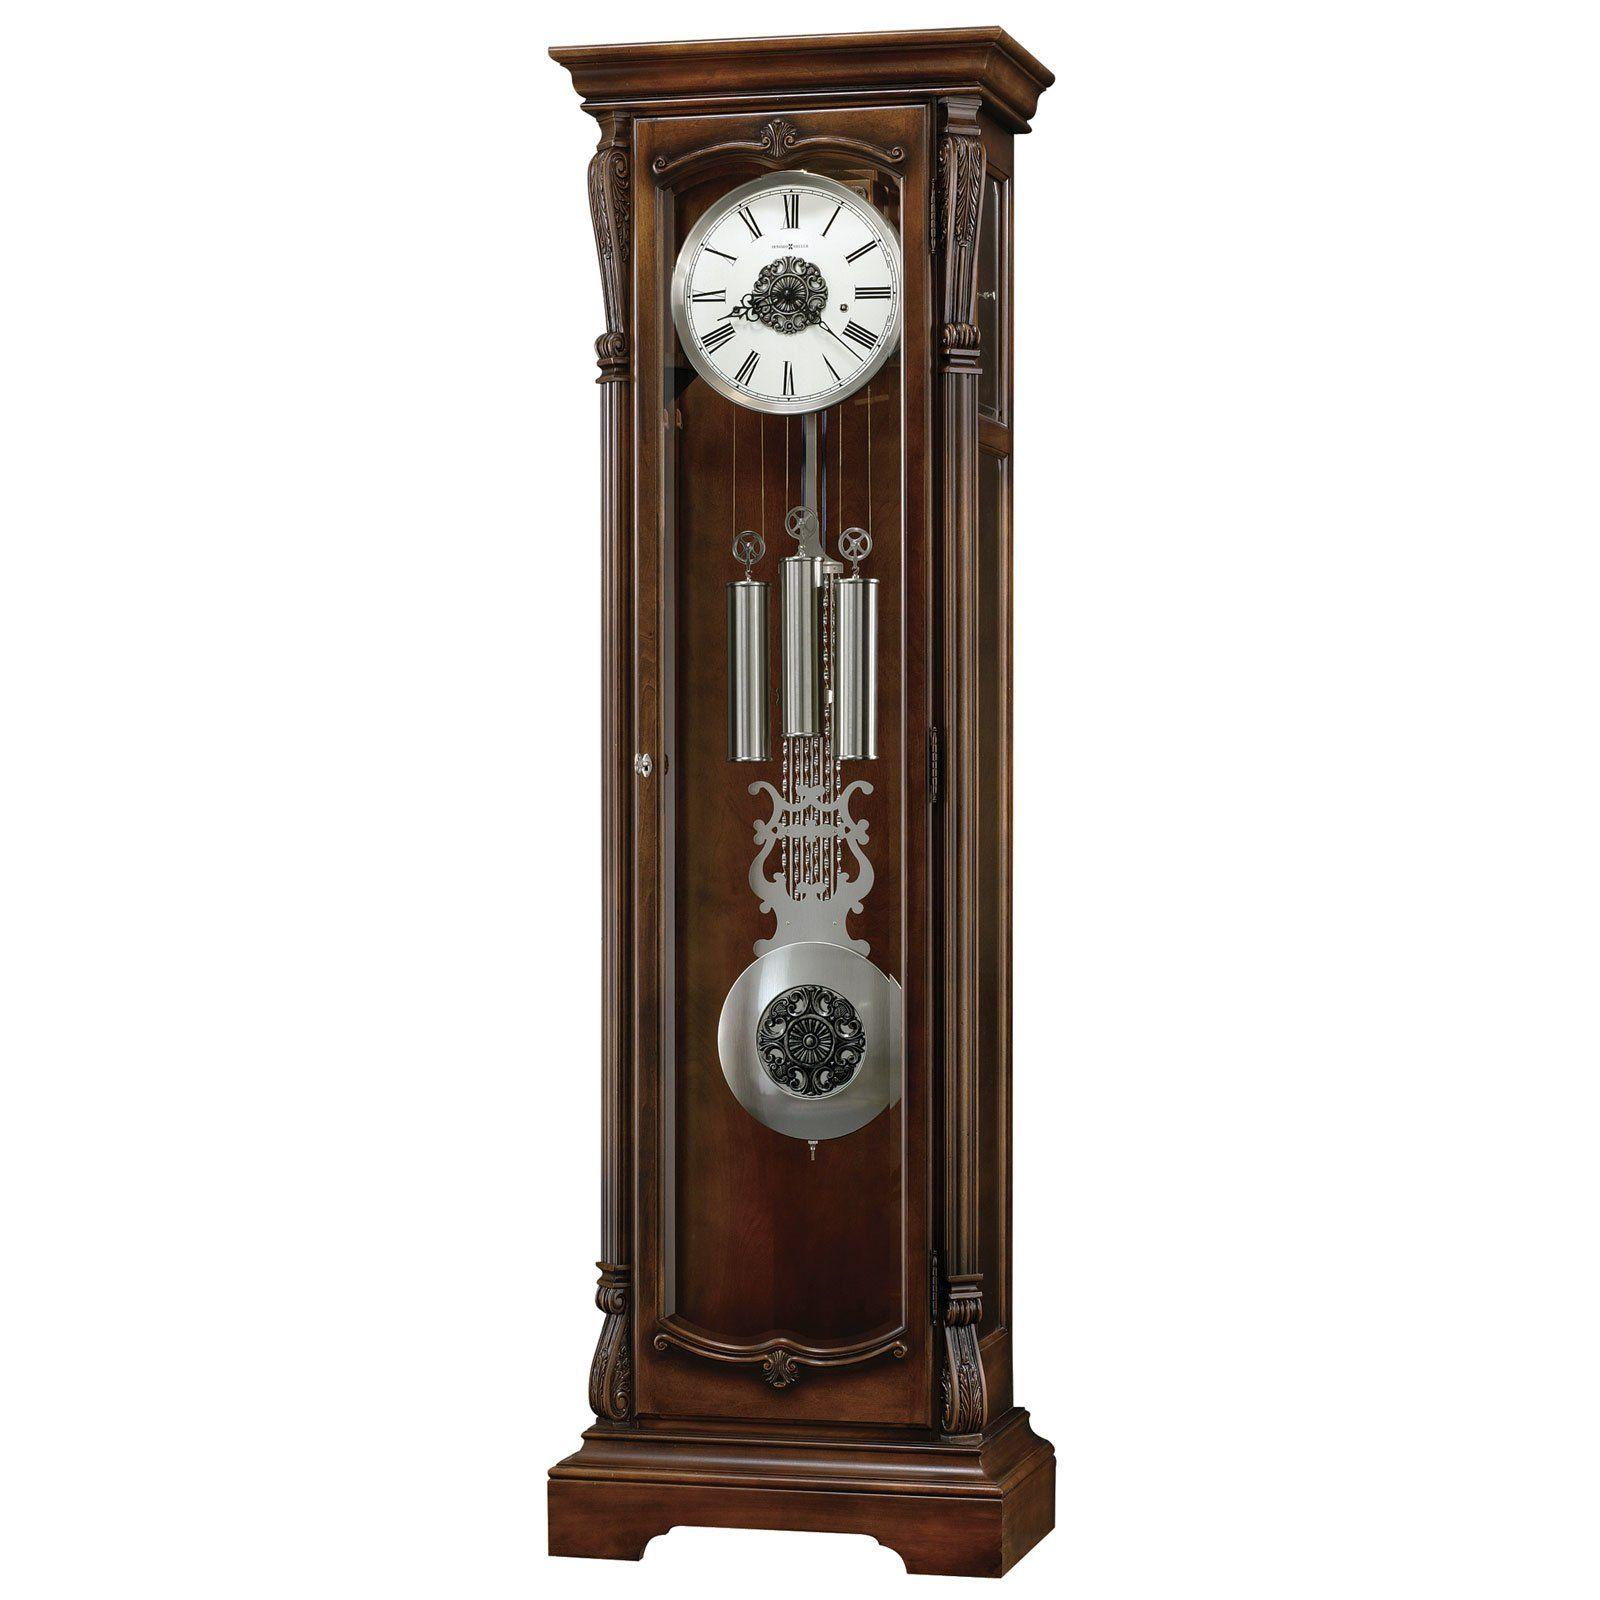 Grandfather Clocks Grandfather Clock Modern Grandfather Clocks Grandfather Clock Grandfather Clock Clock Antique Wall Clock